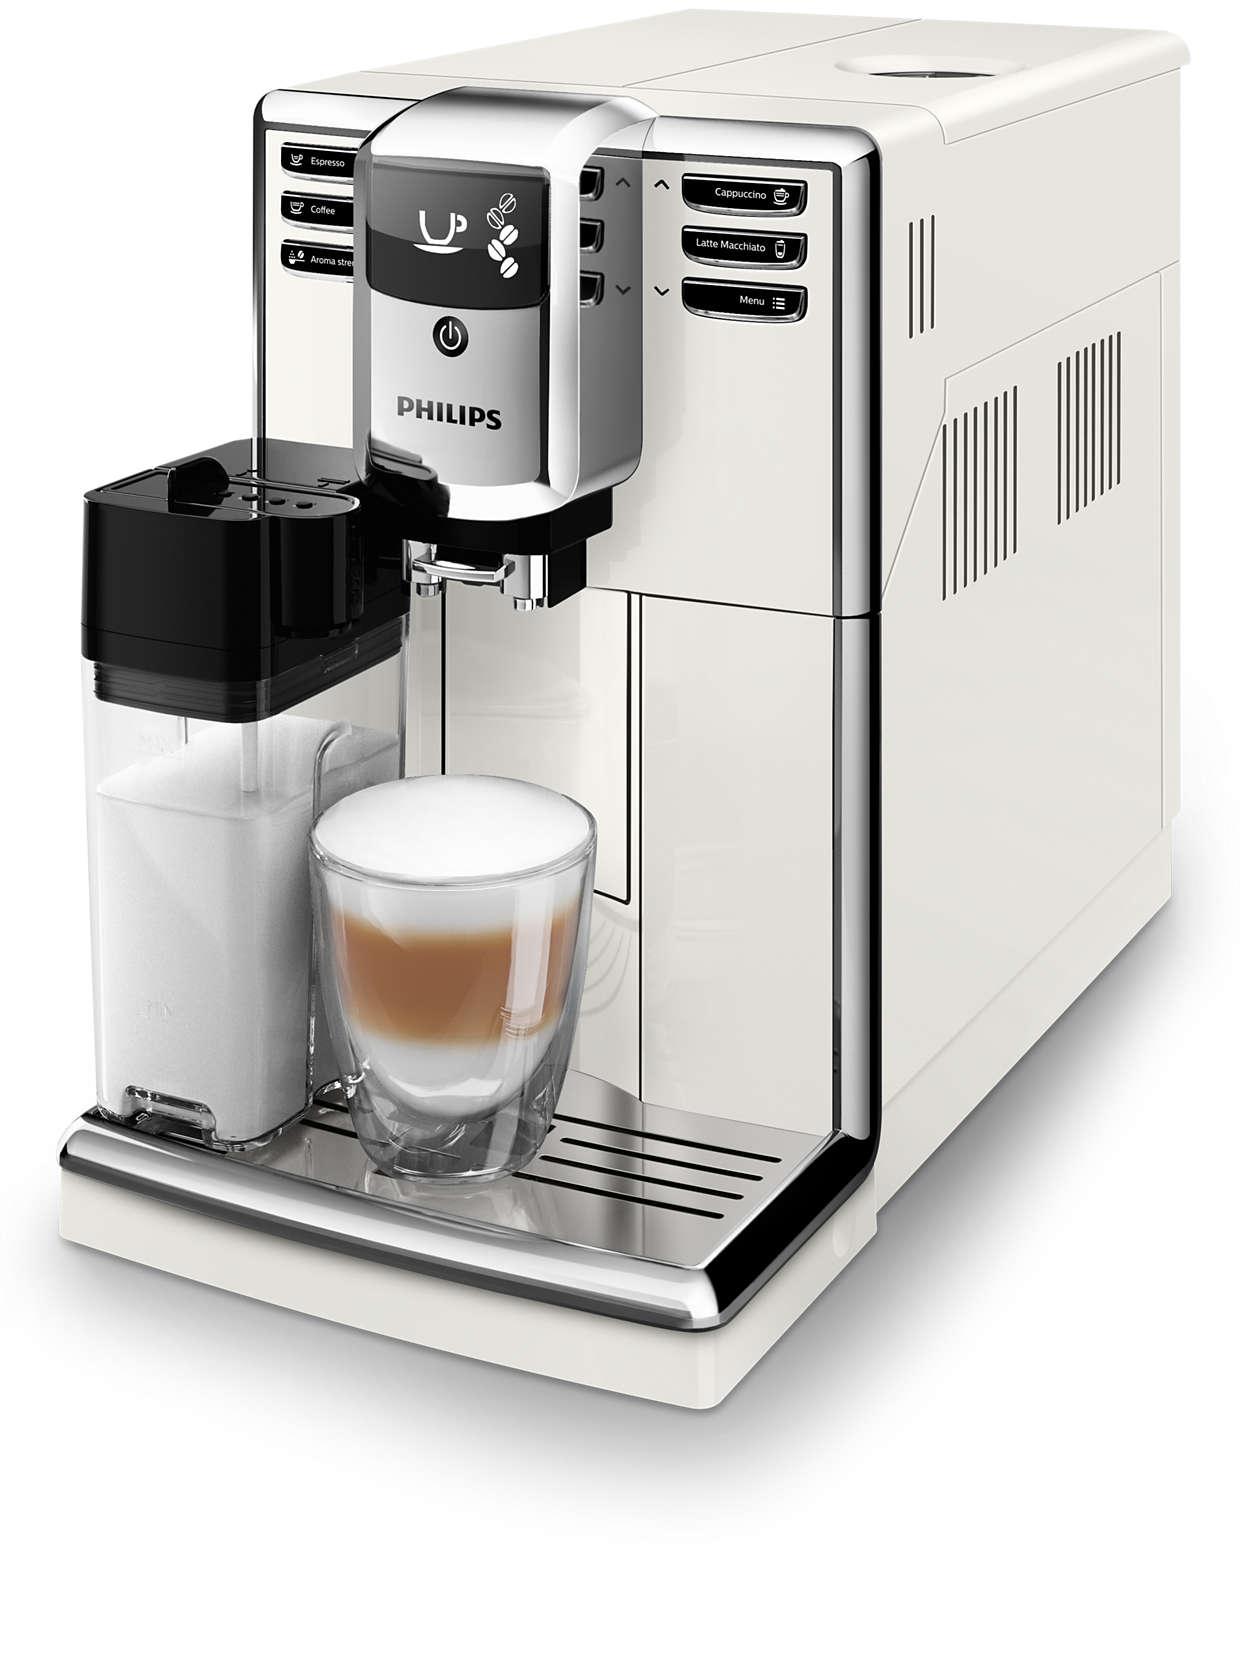 series 5000 kaffeevollautomat ep5361 10 philips. Black Bedroom Furniture Sets. Home Design Ideas